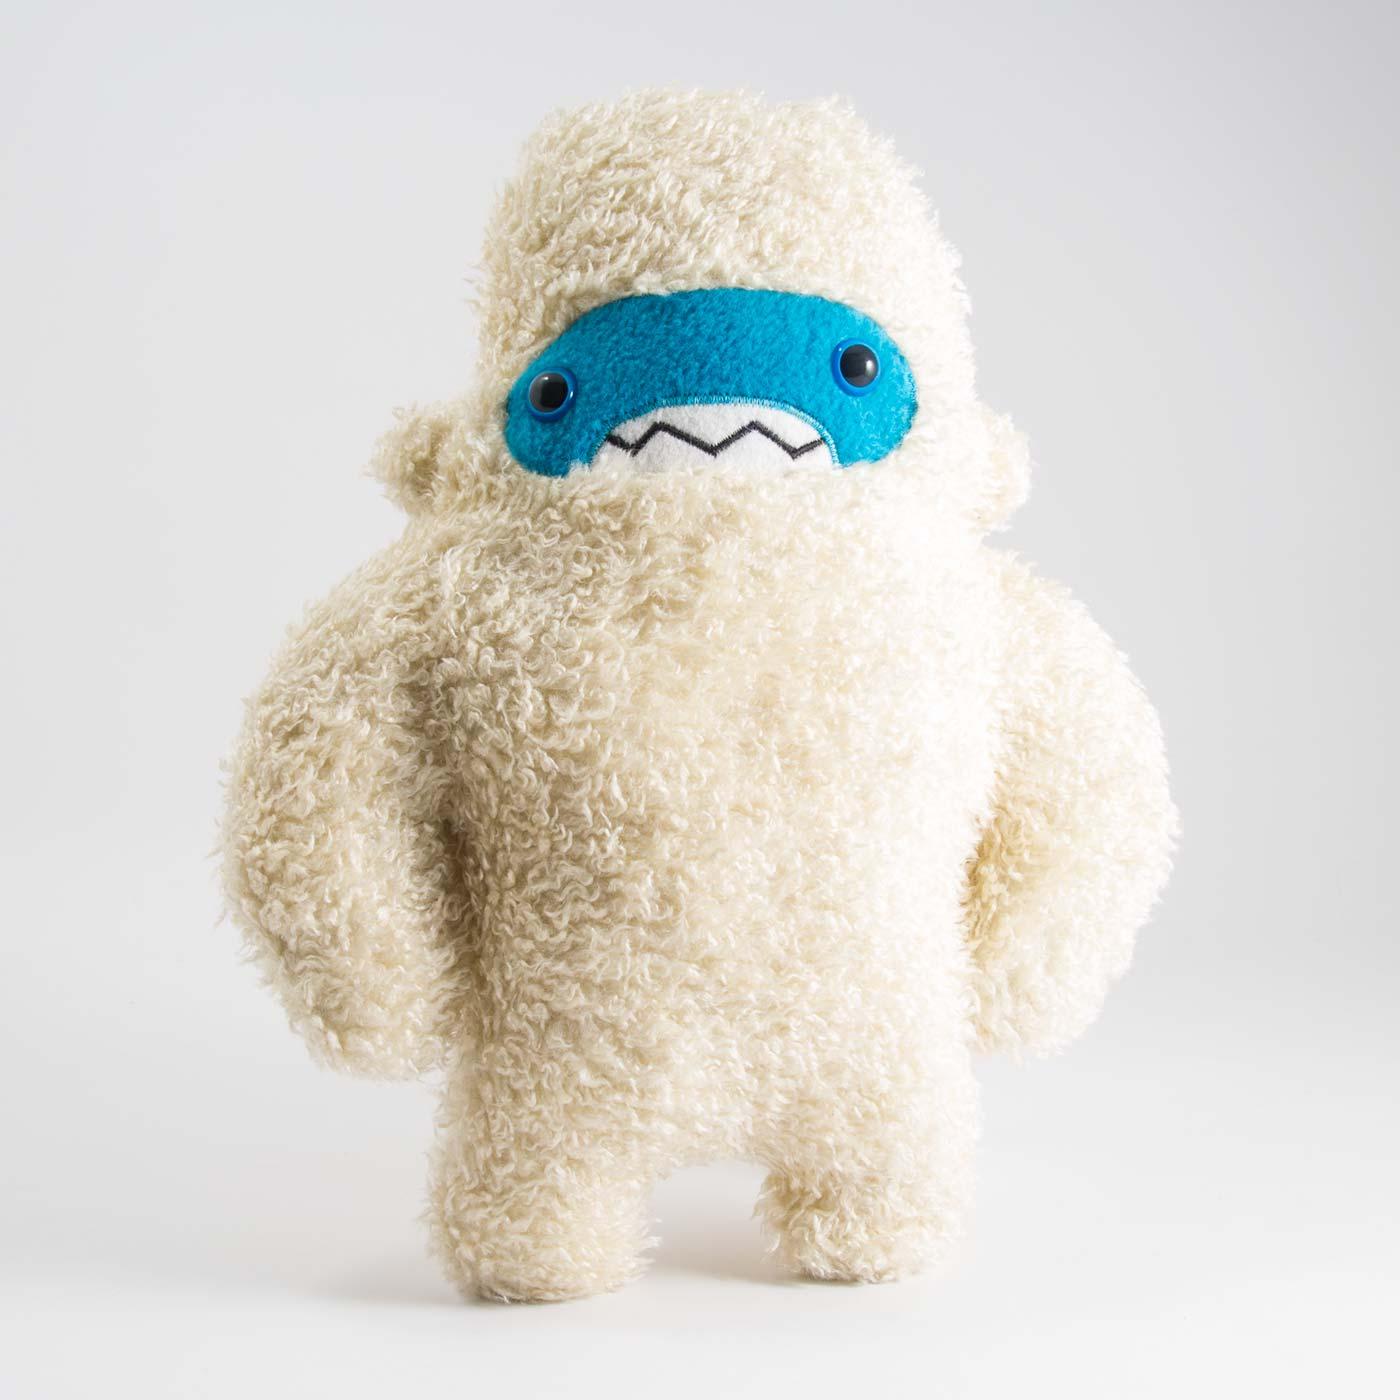 woolly-yeti-1.jpg